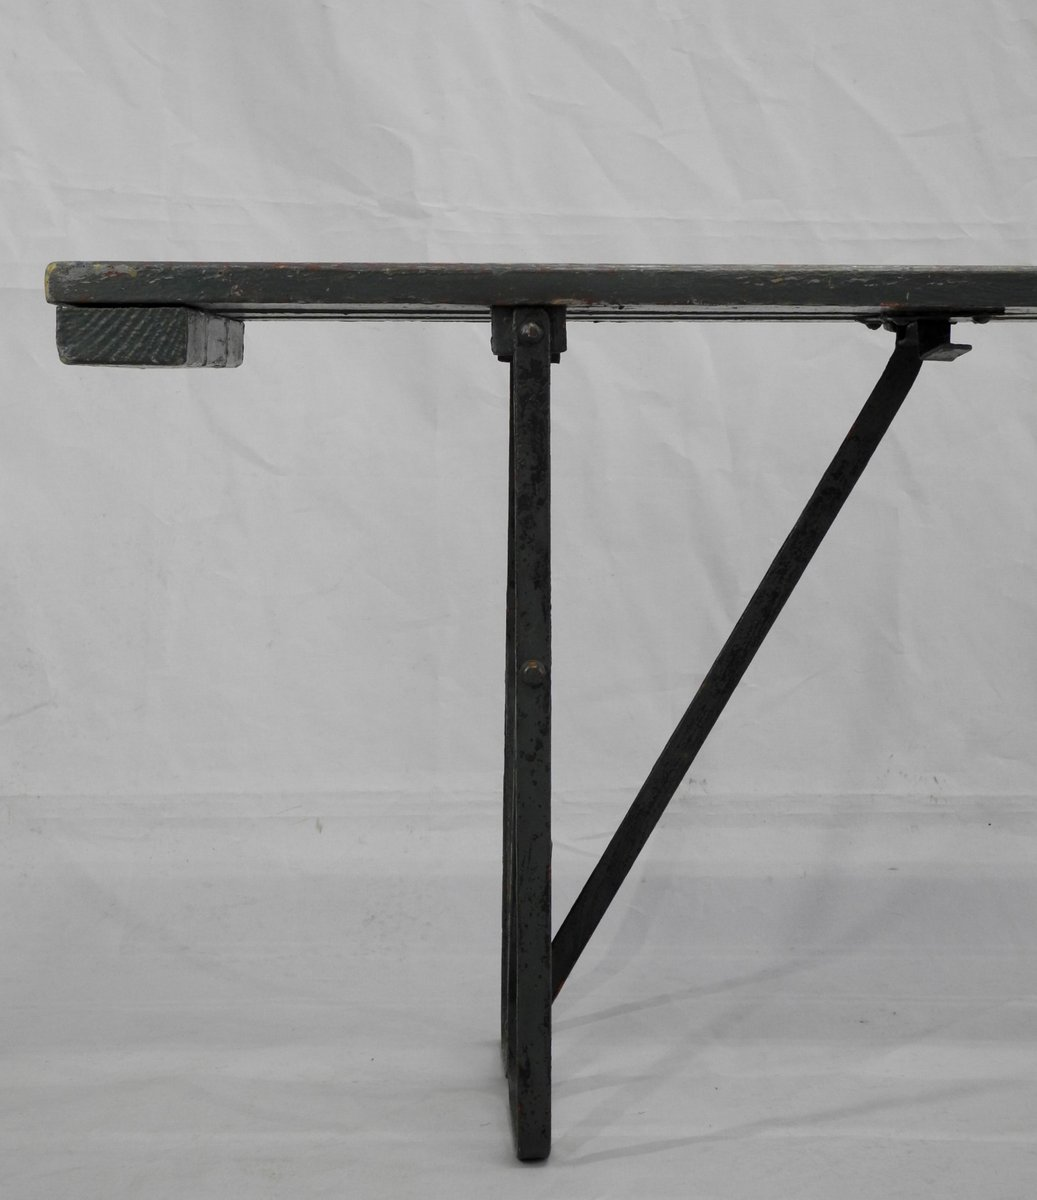 vintage klappbank aus holz metall bei pamono kaufen. Black Bedroom Furniture Sets. Home Design Ideas